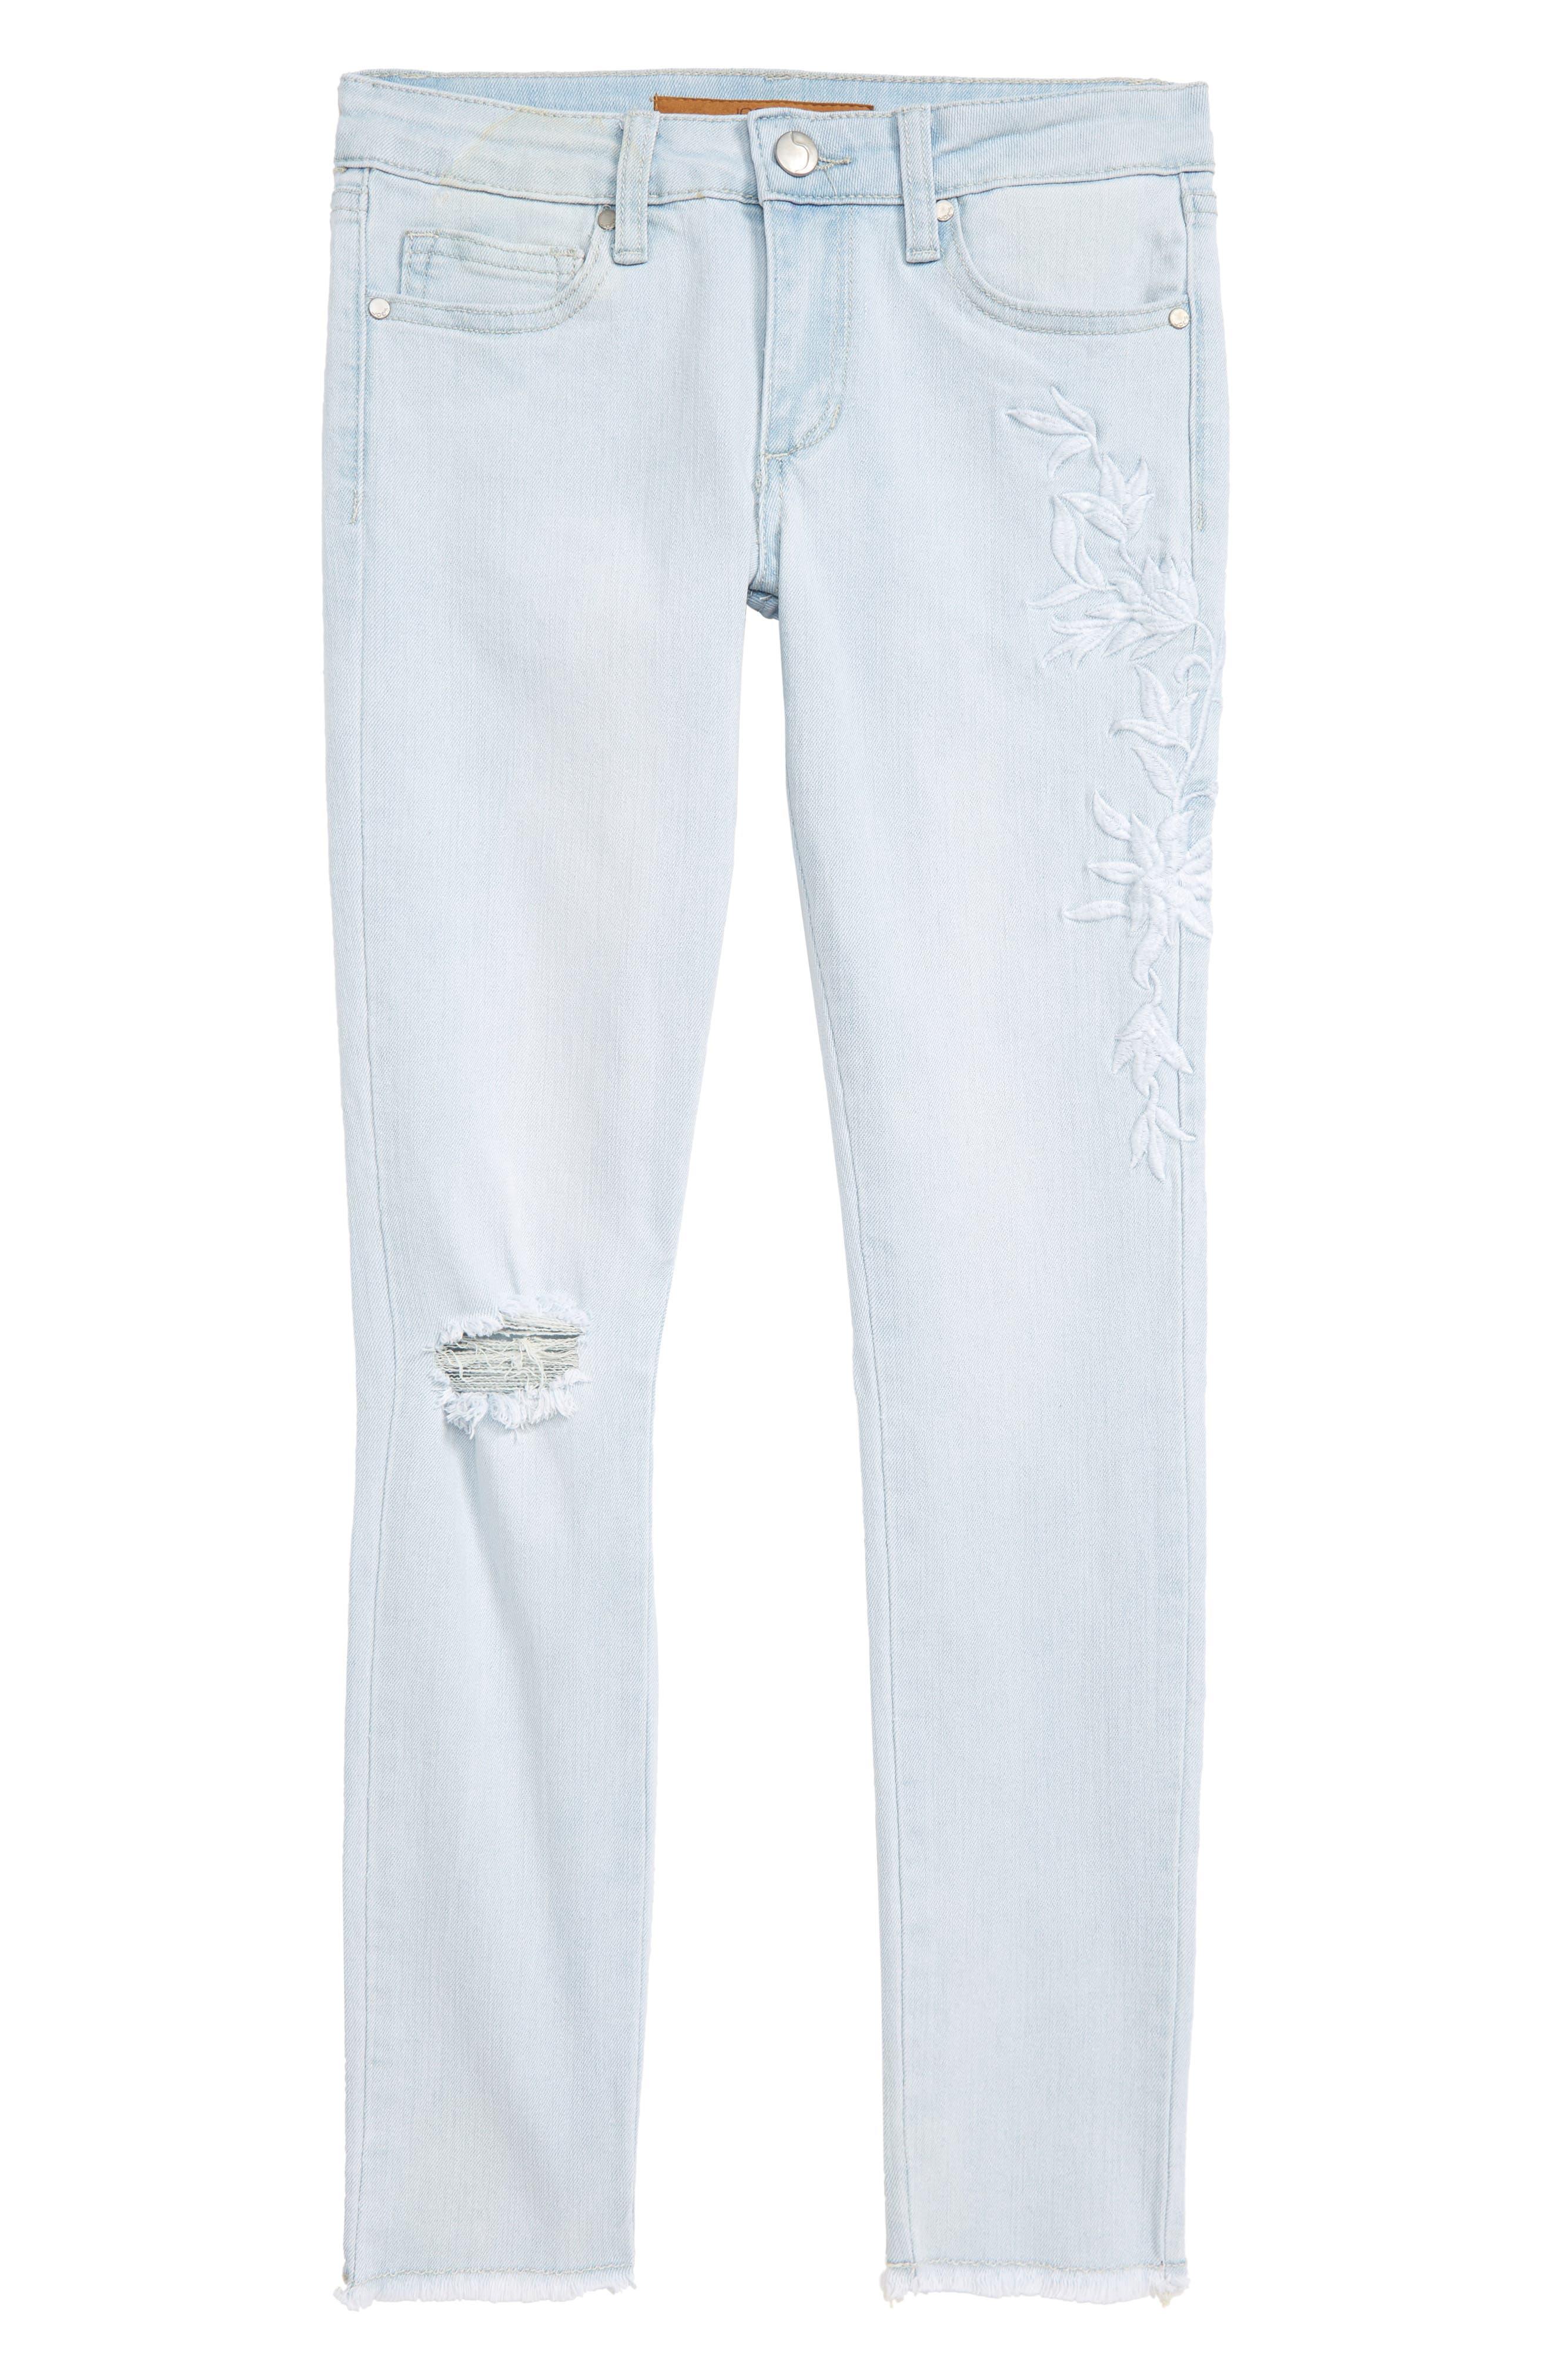 JOE'S, The Markie Ankle Skinny Jeans, Main thumbnail 1, color, ELIN